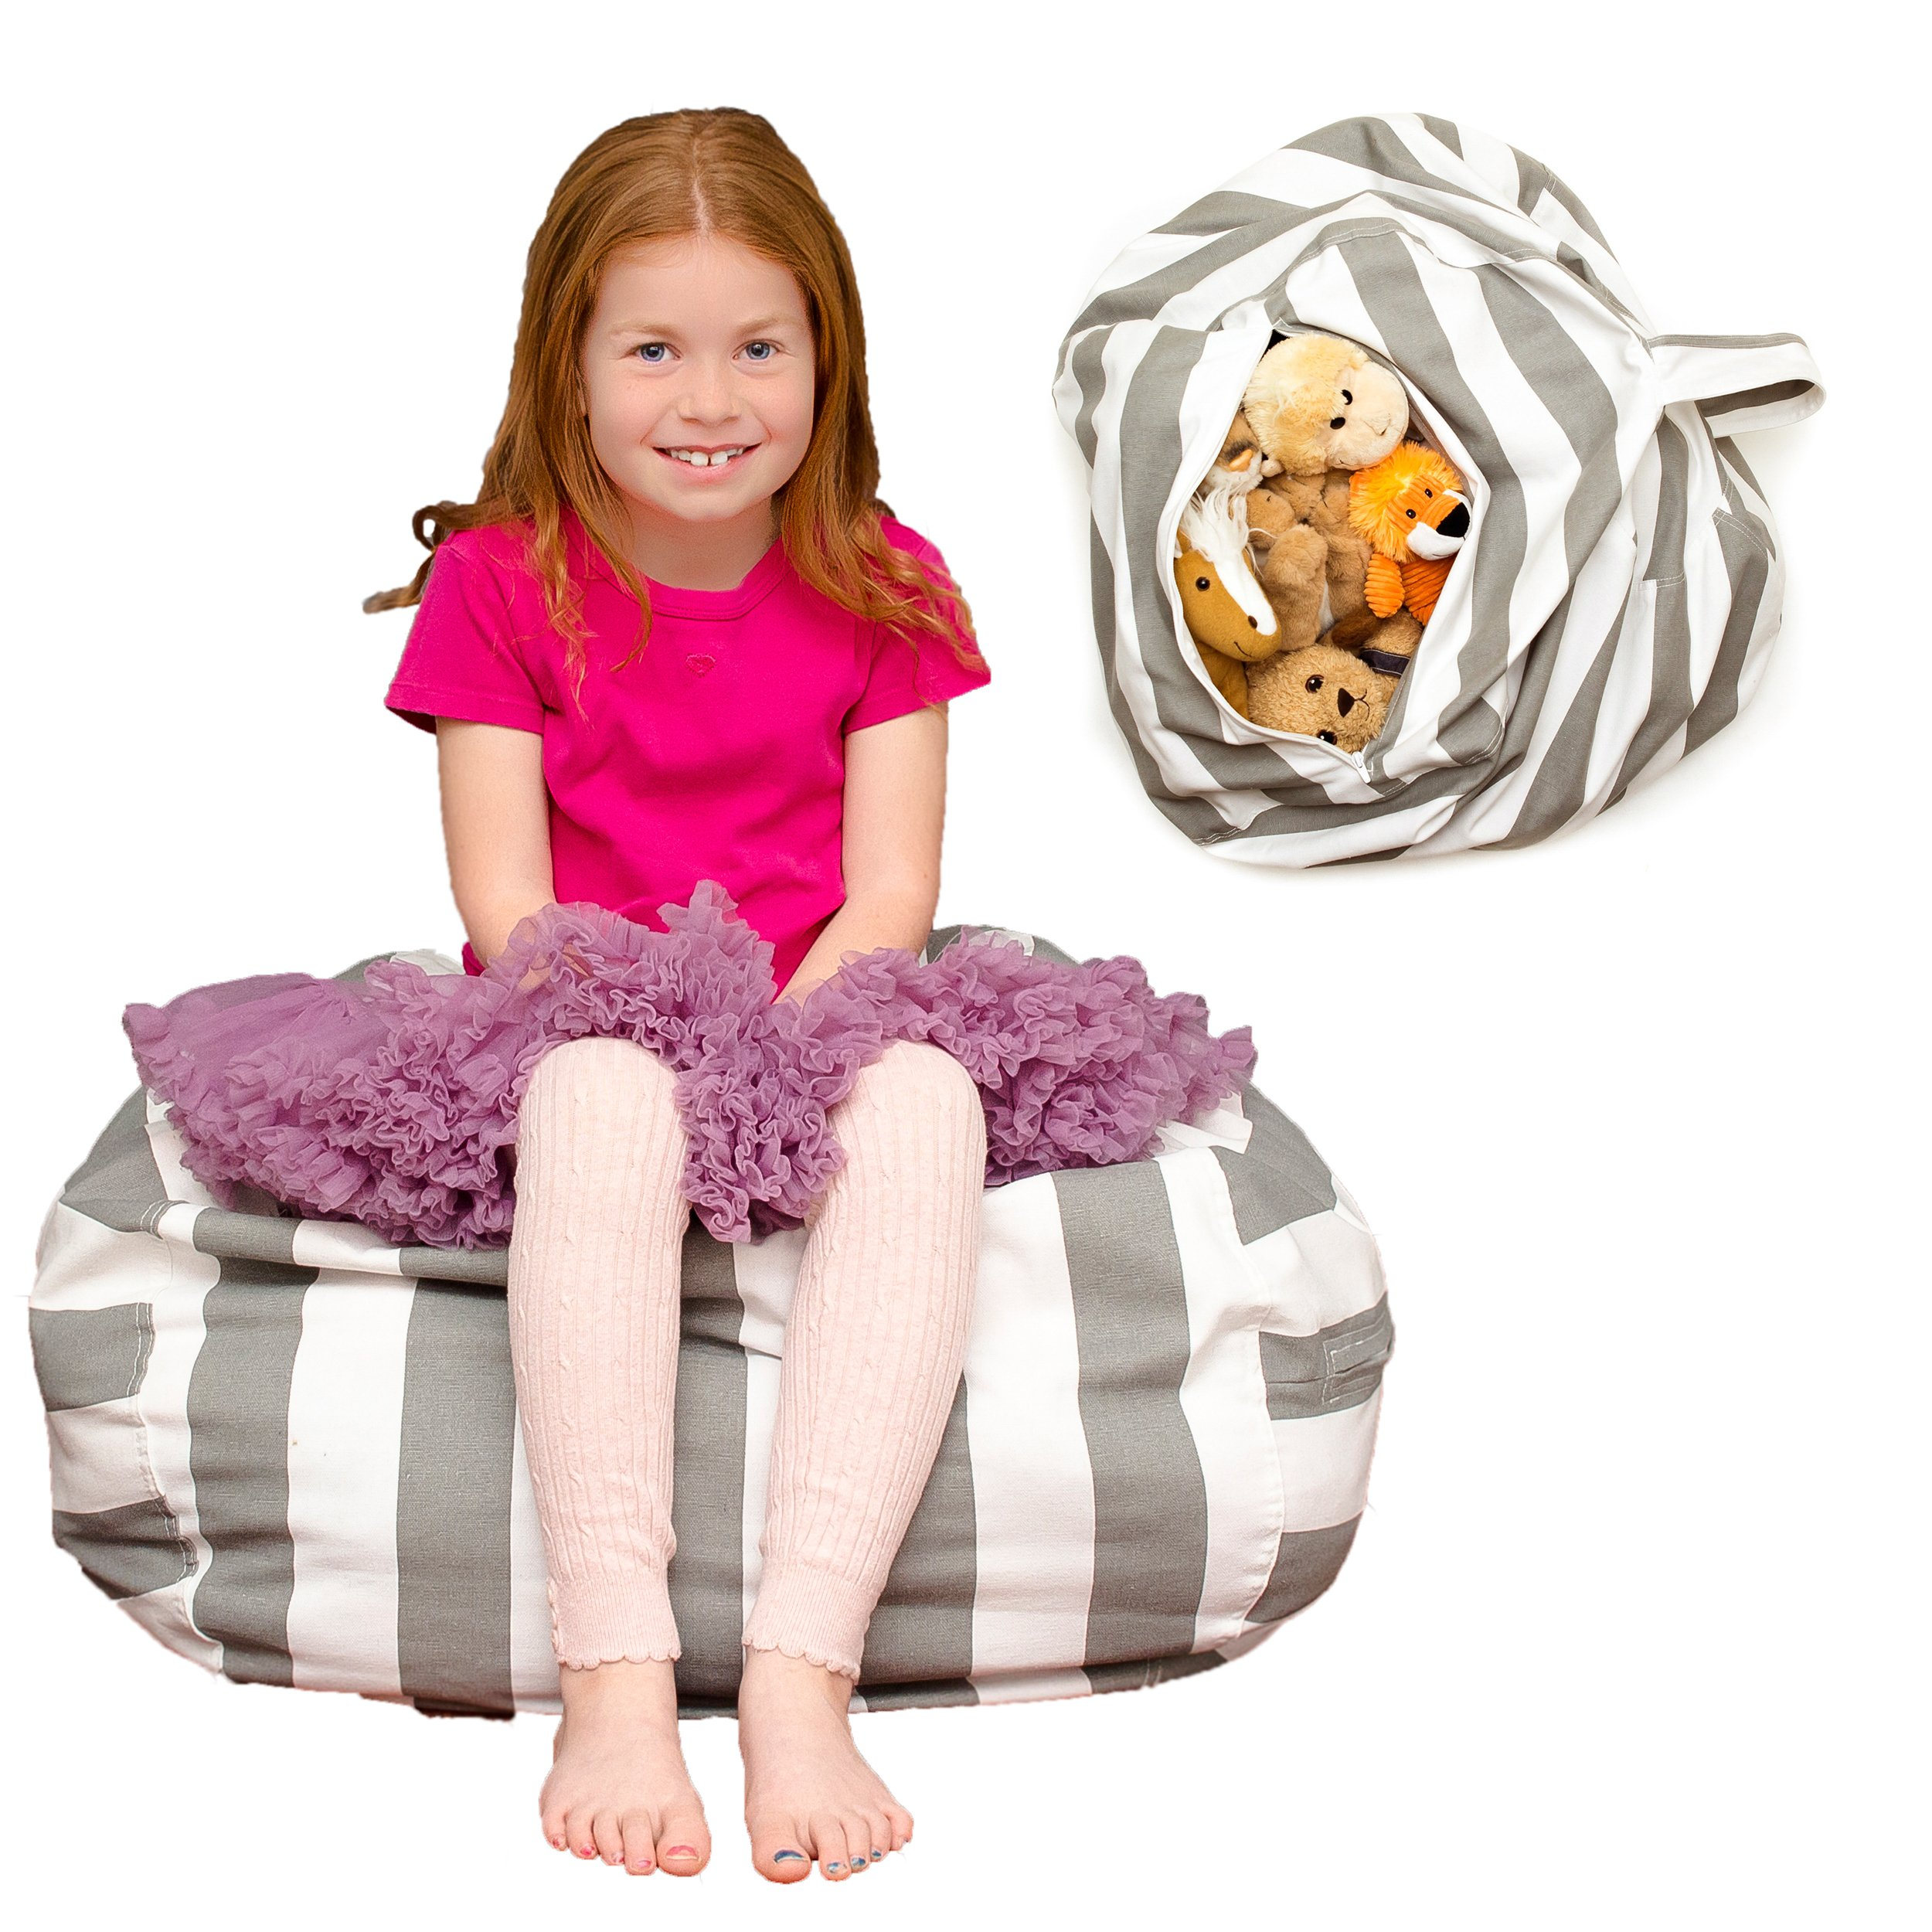 Lonnadi Toy Storage Bean Bag - LARGE - Stuffed Animal Storage Bean Bag Chair - Multi-Purpose Home Storage Solution